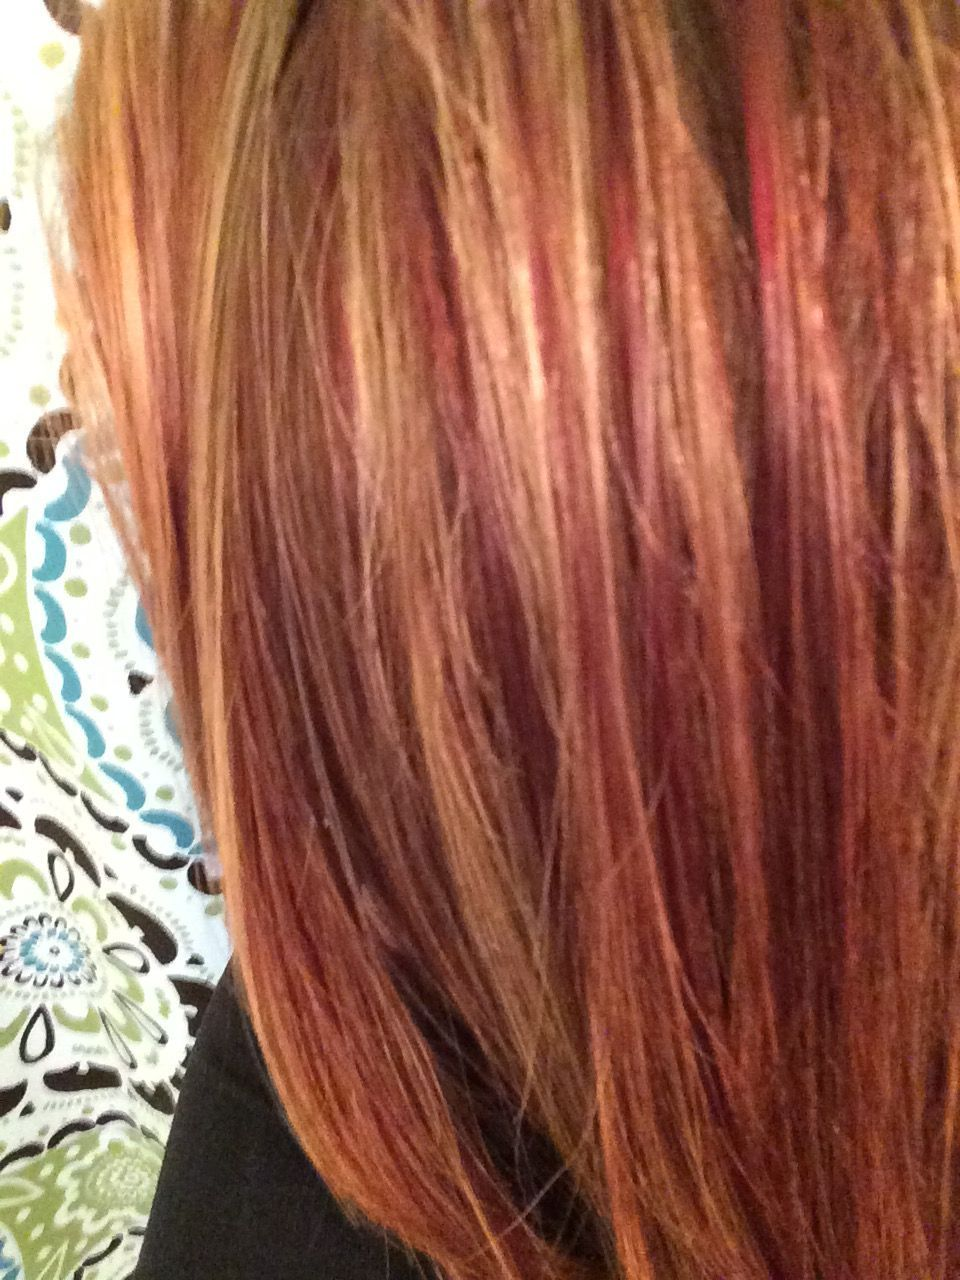 , strawberryredhair in 2020 Natural red hair, Hair